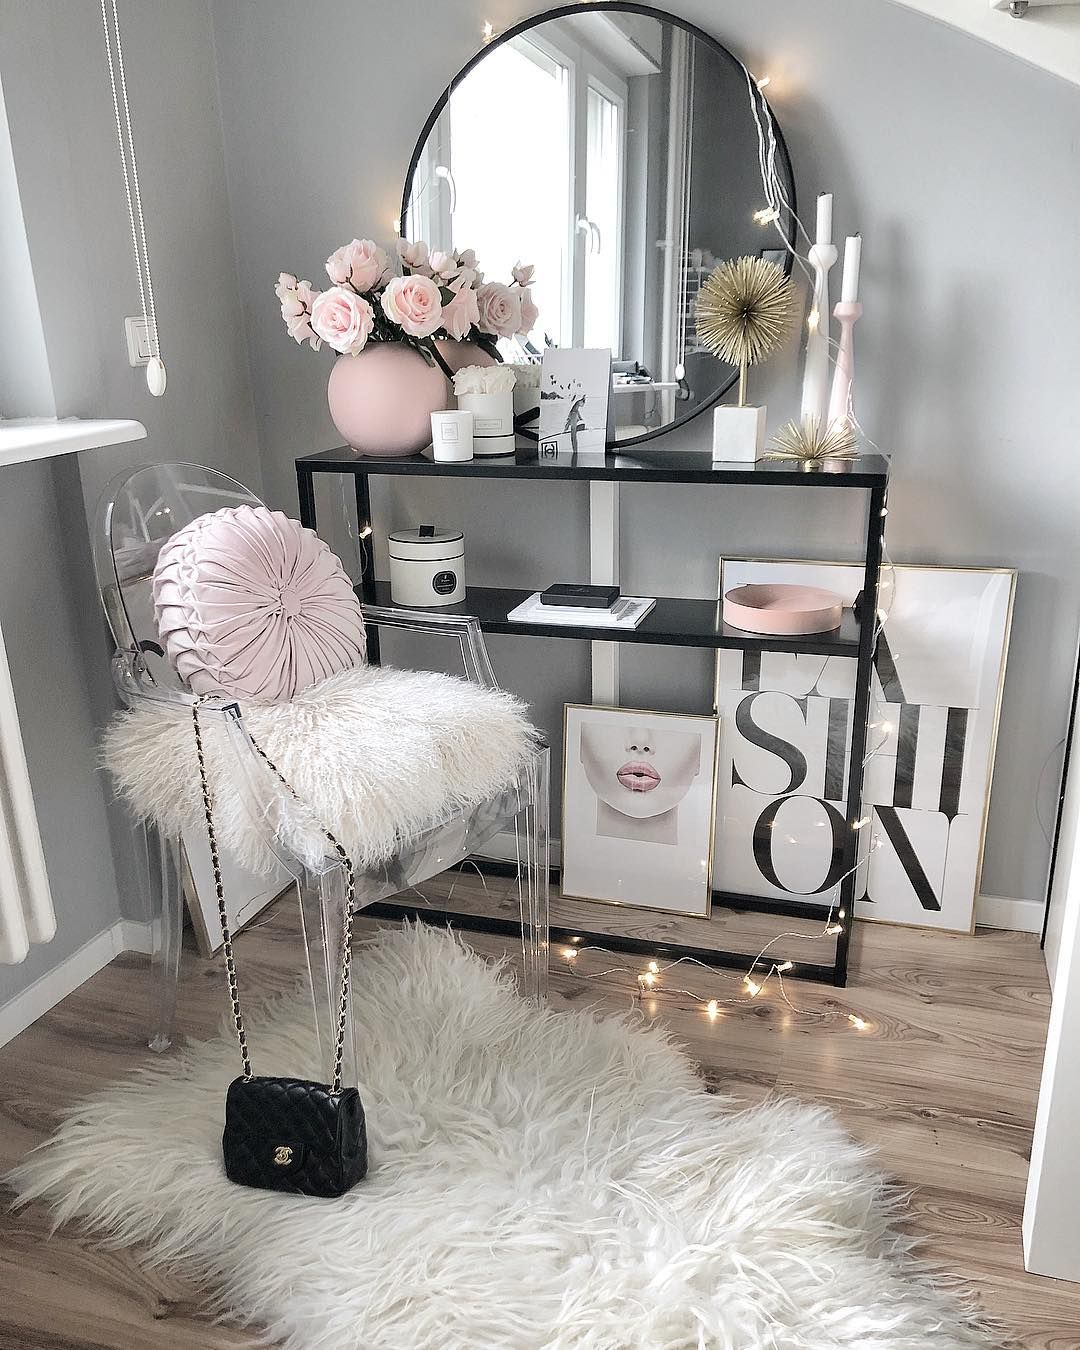 Tumblr Make Up Desks Girly Decoration Teen Girl Room In 2018